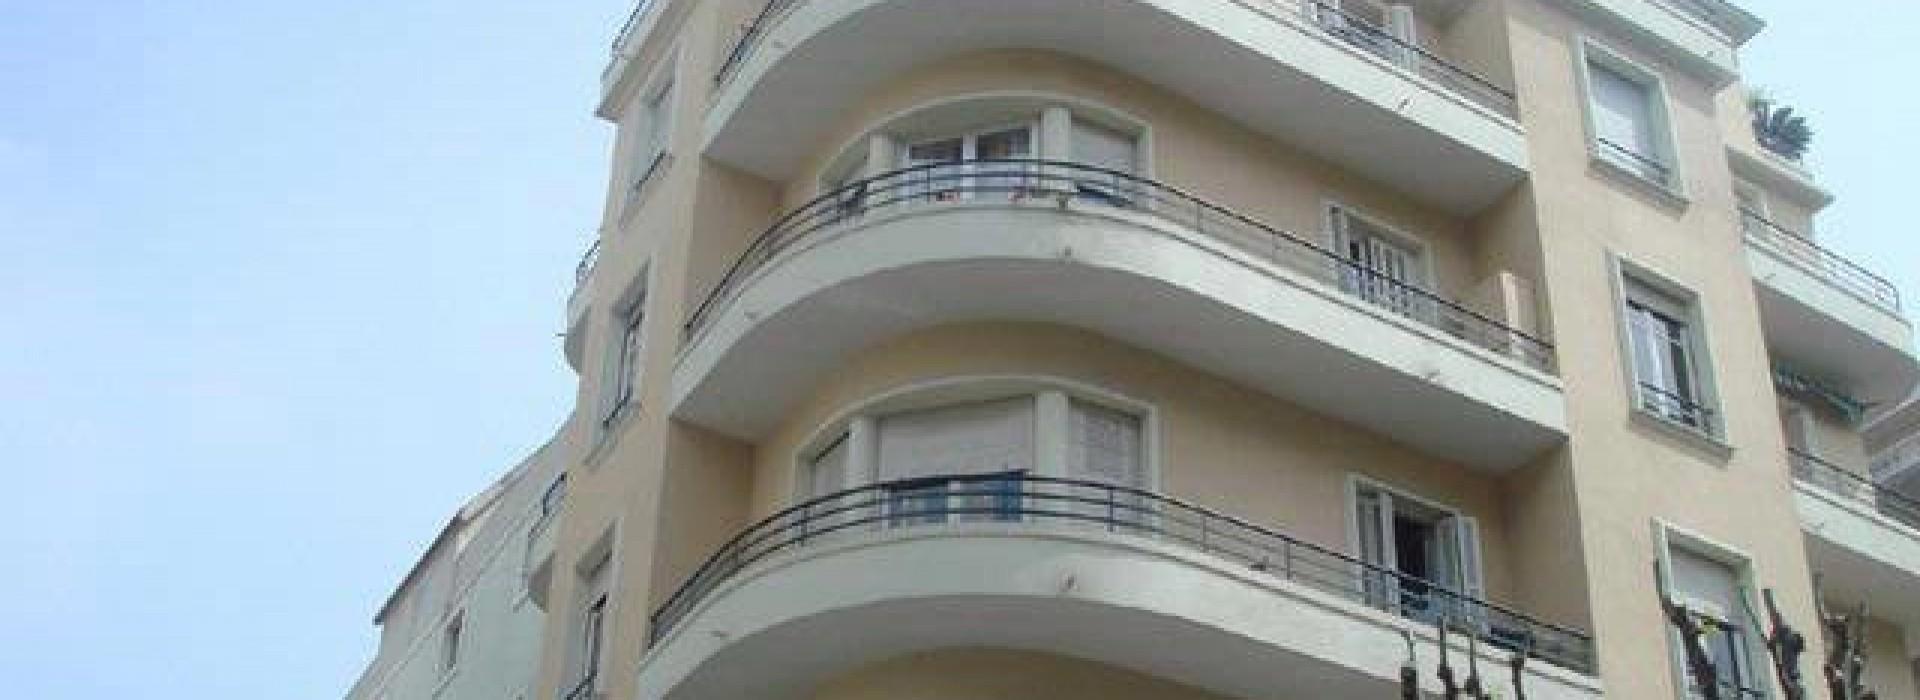 Appartement Nice 1 Pièce 21m2 120,000€